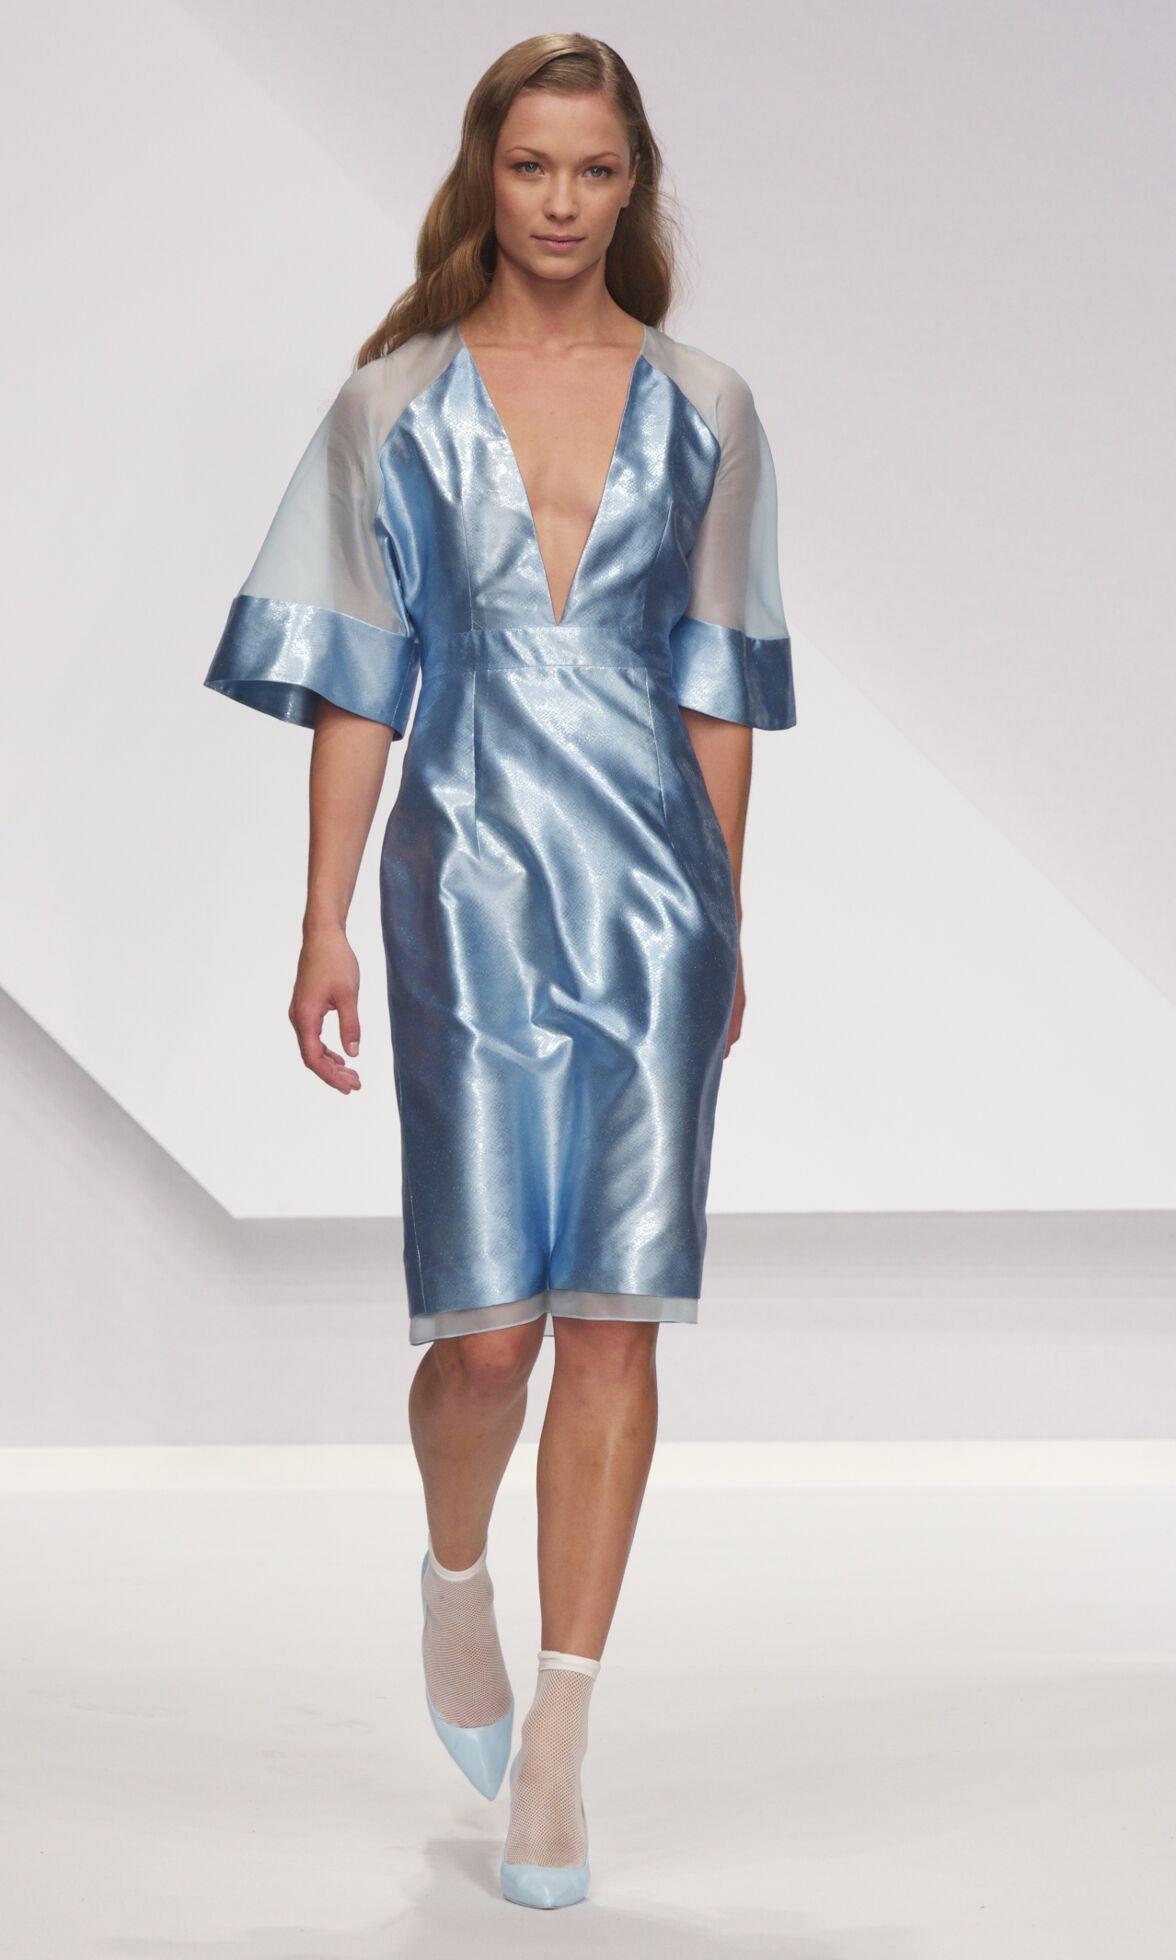 Spring 2014 Woman Fashion Show Krizia